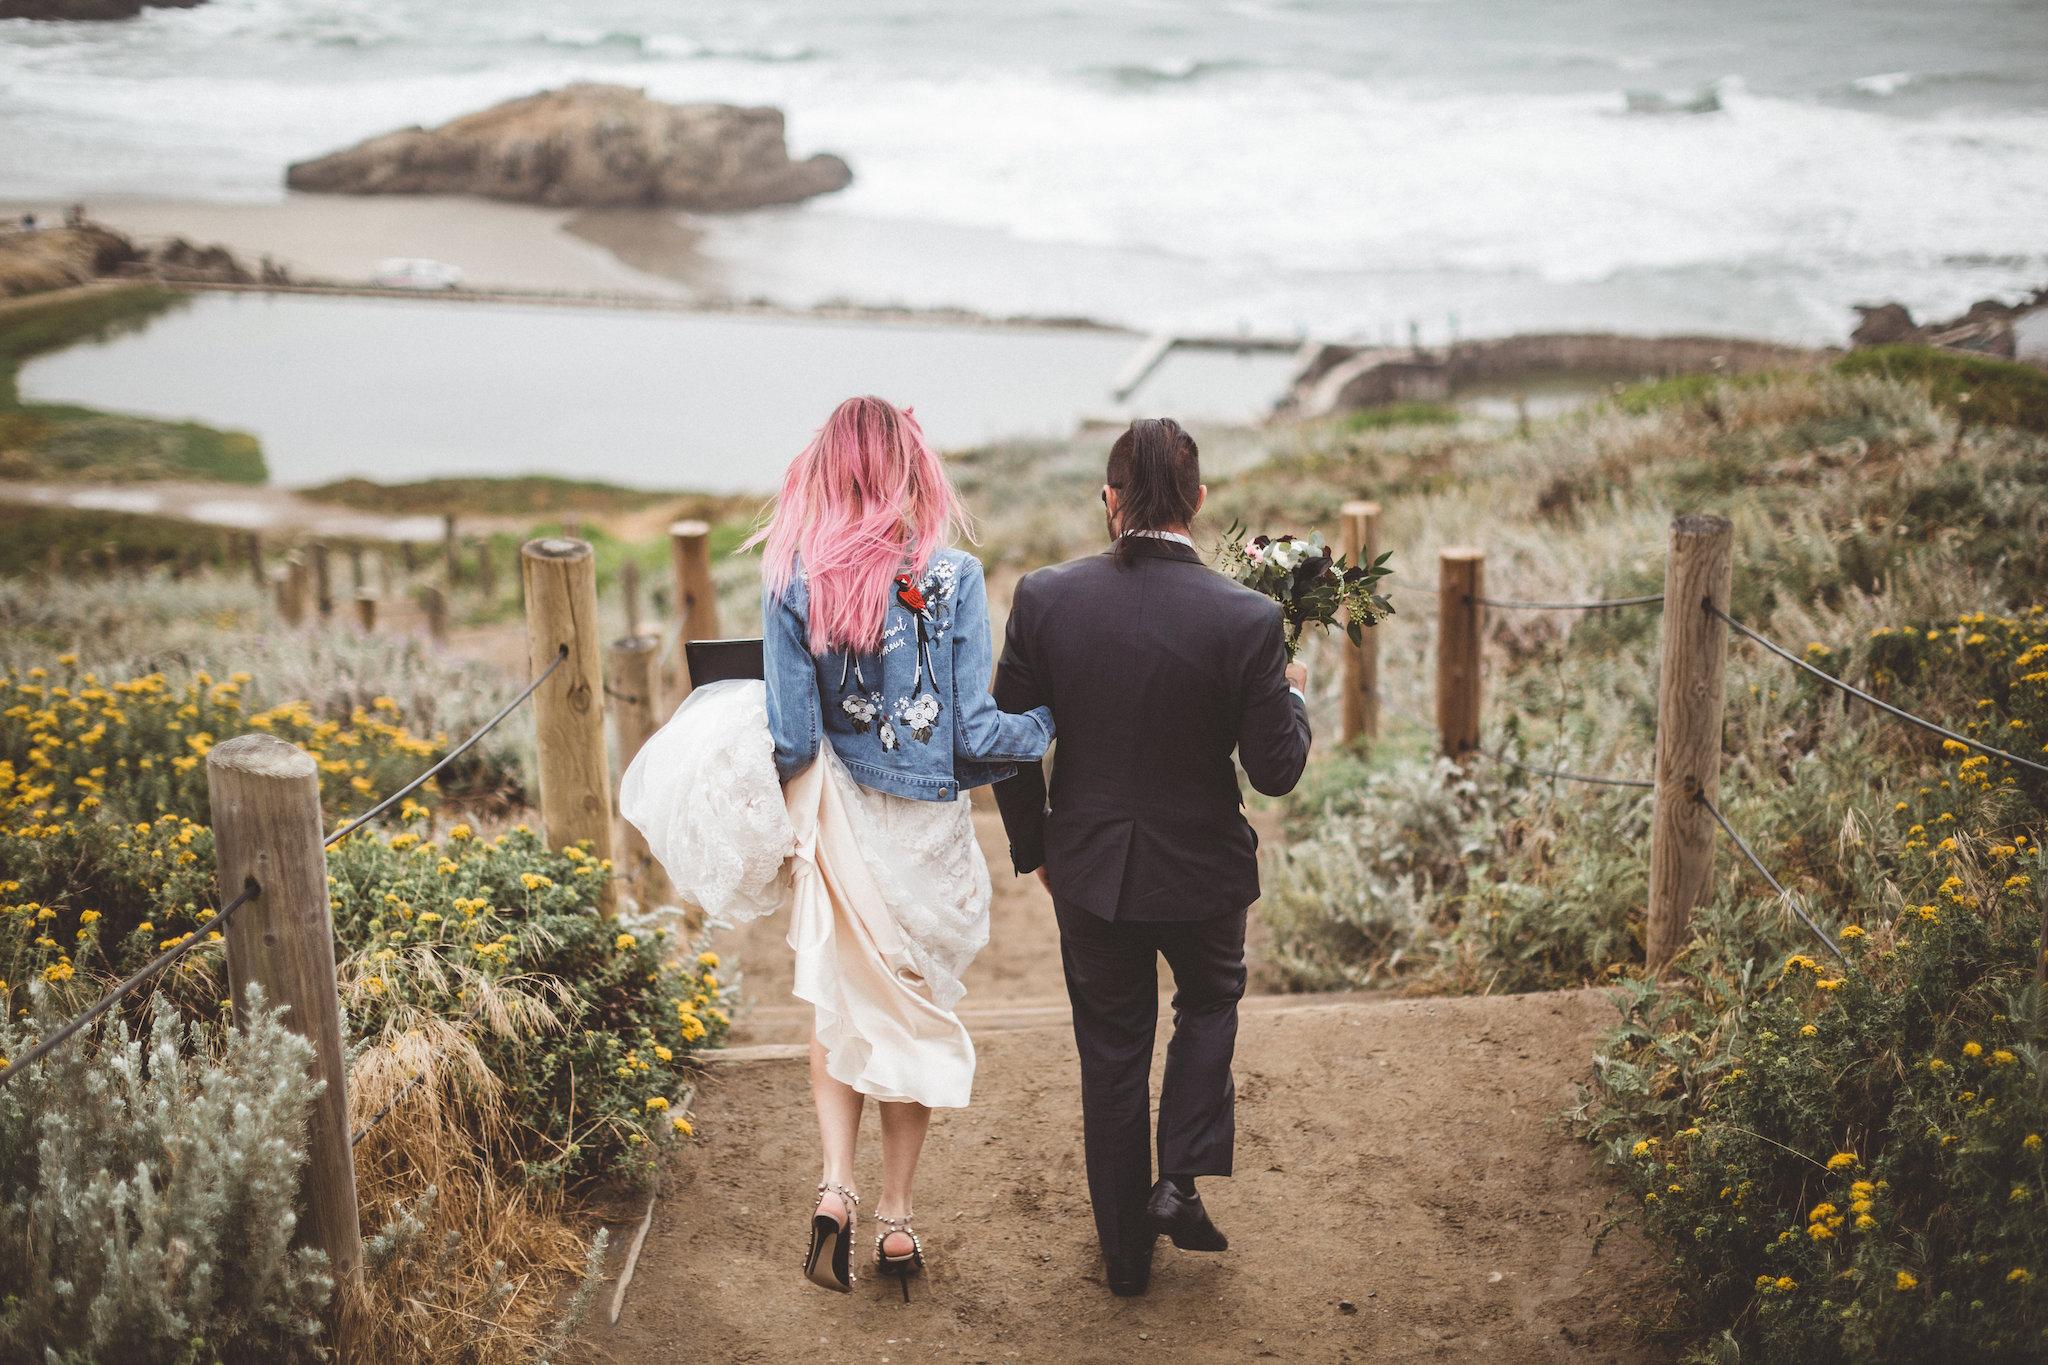 kris-and-andreas-san-francisco-elopement-adventure57.jpg